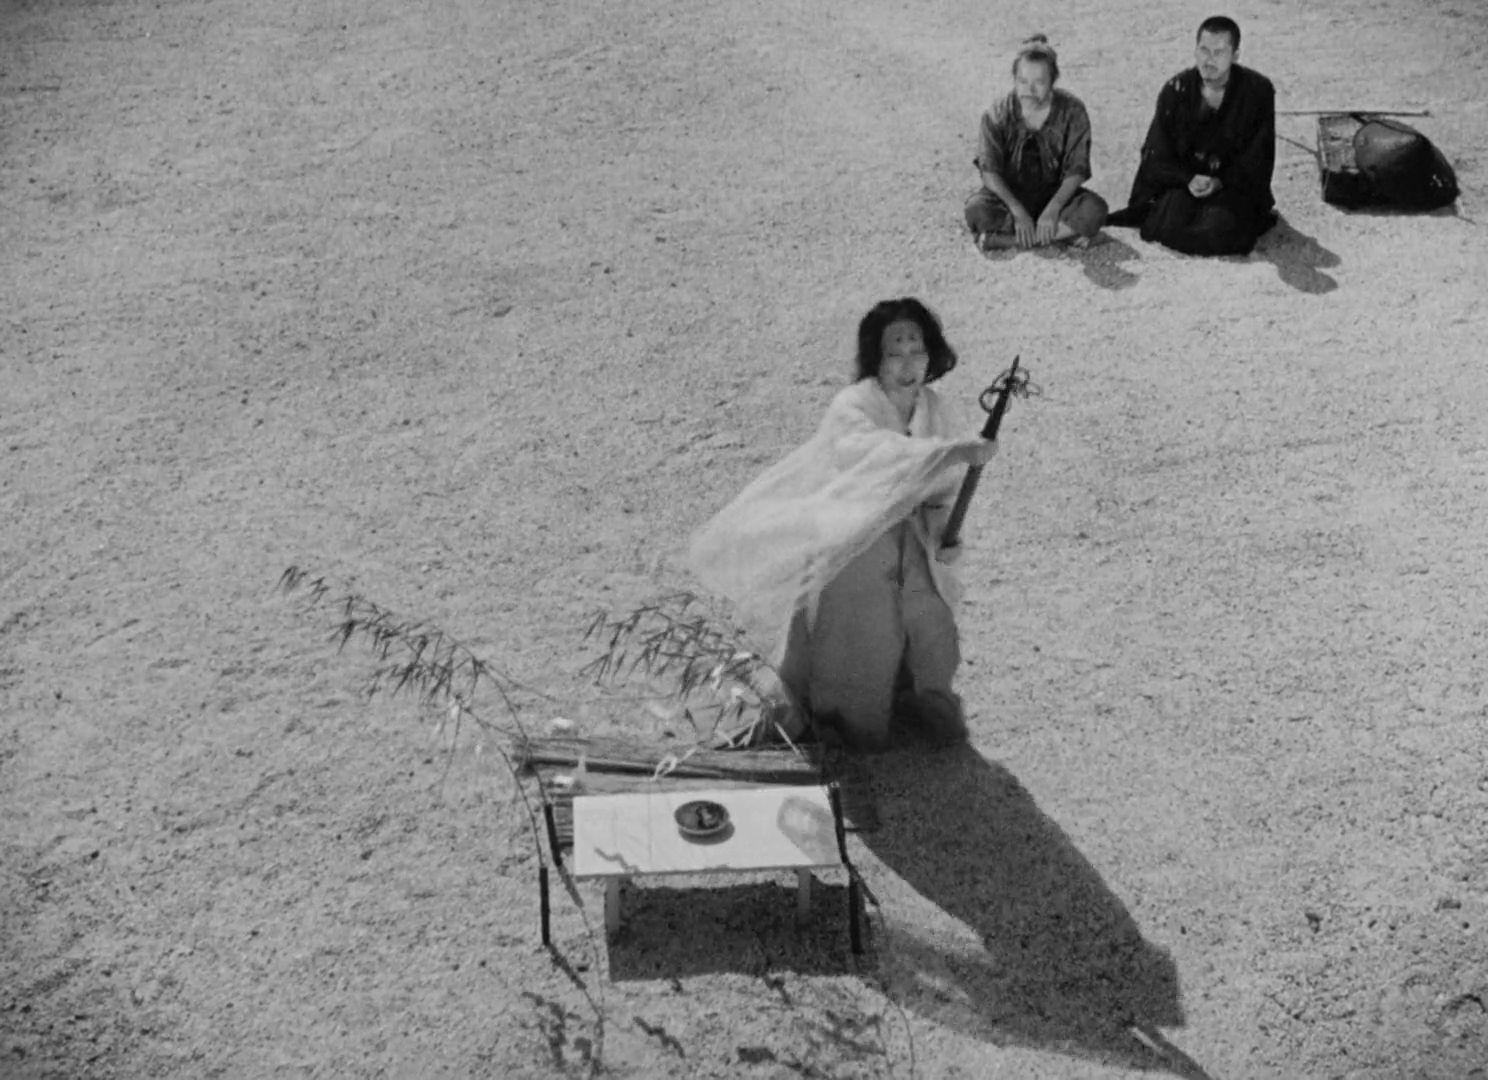 Rashomon (1950)-Part 1/2 English/Chinese subtitles - video ...